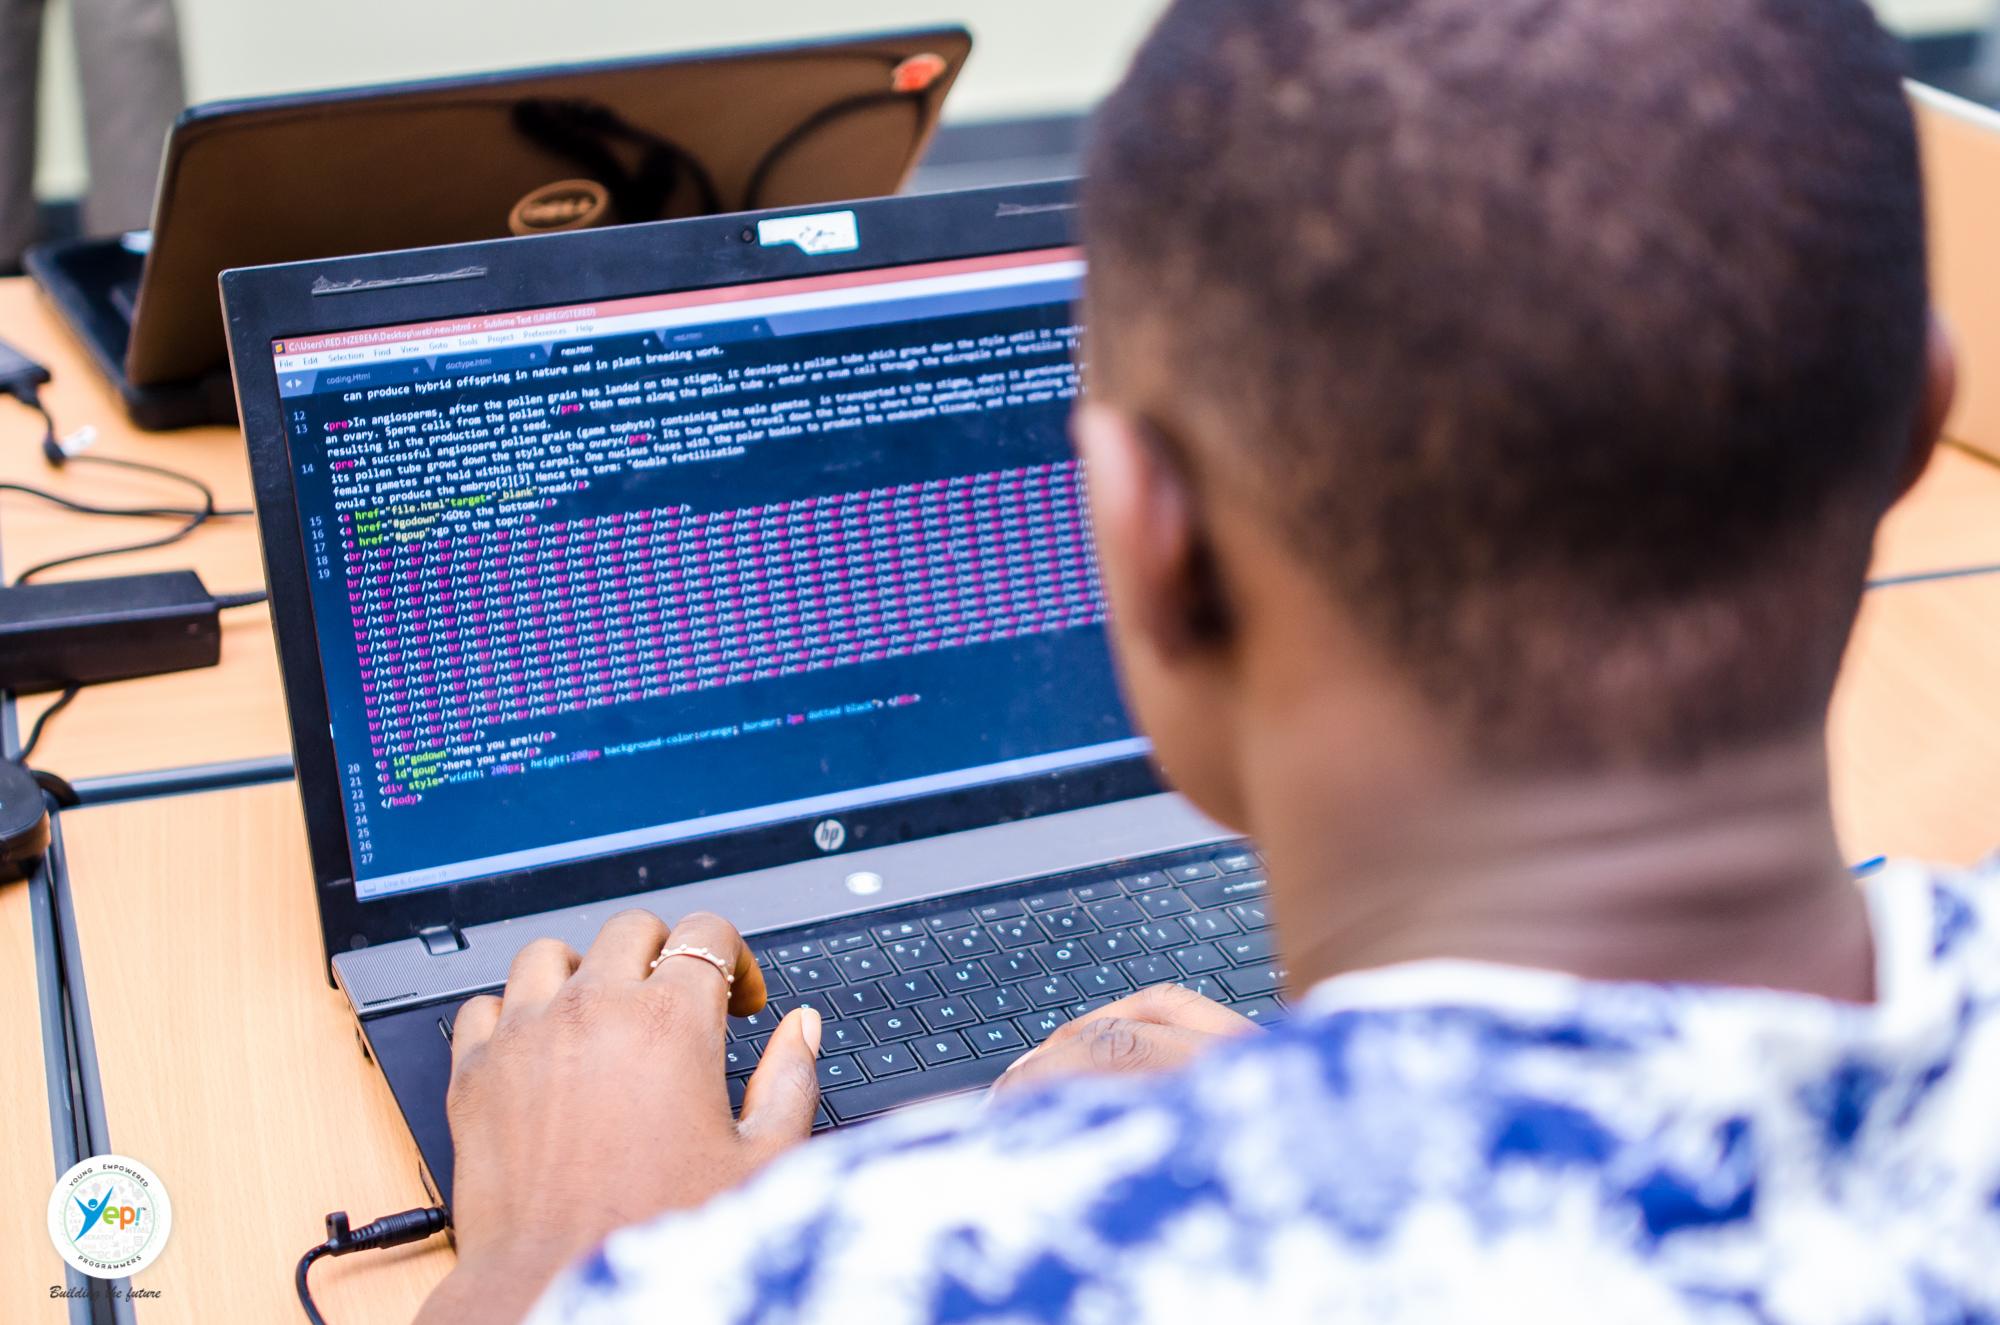 Online Coding Lessons, Coding for Kids, Coding with Scratch, COMPUTER programming, Robotics, LEGO Robotics,